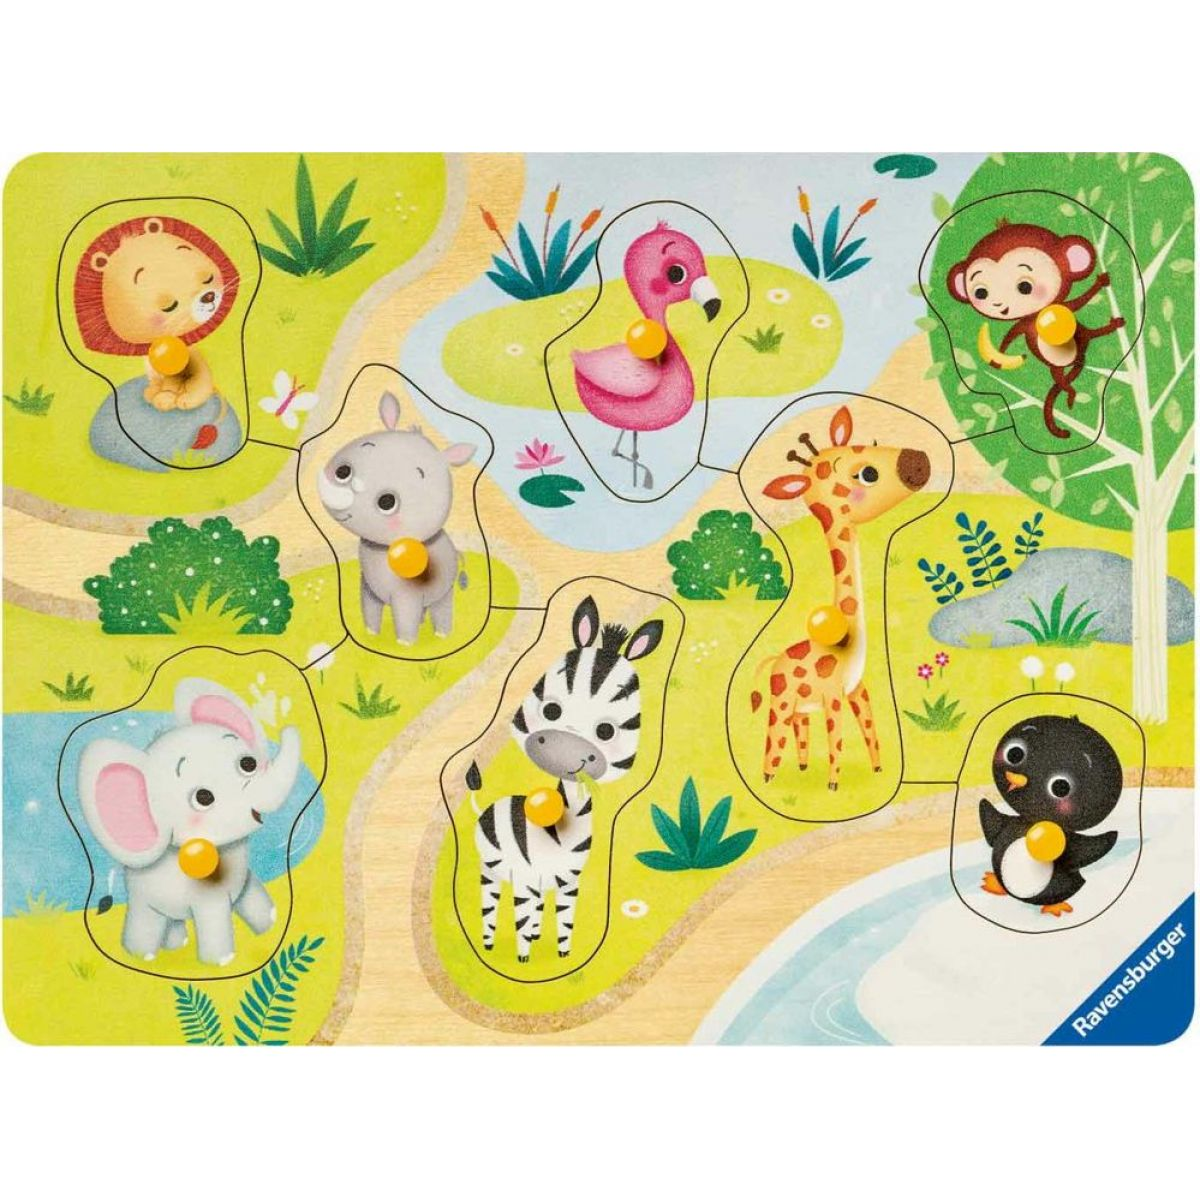 Ravensburger Puzzle 036875 Zoo zvieratá 8 dielikov